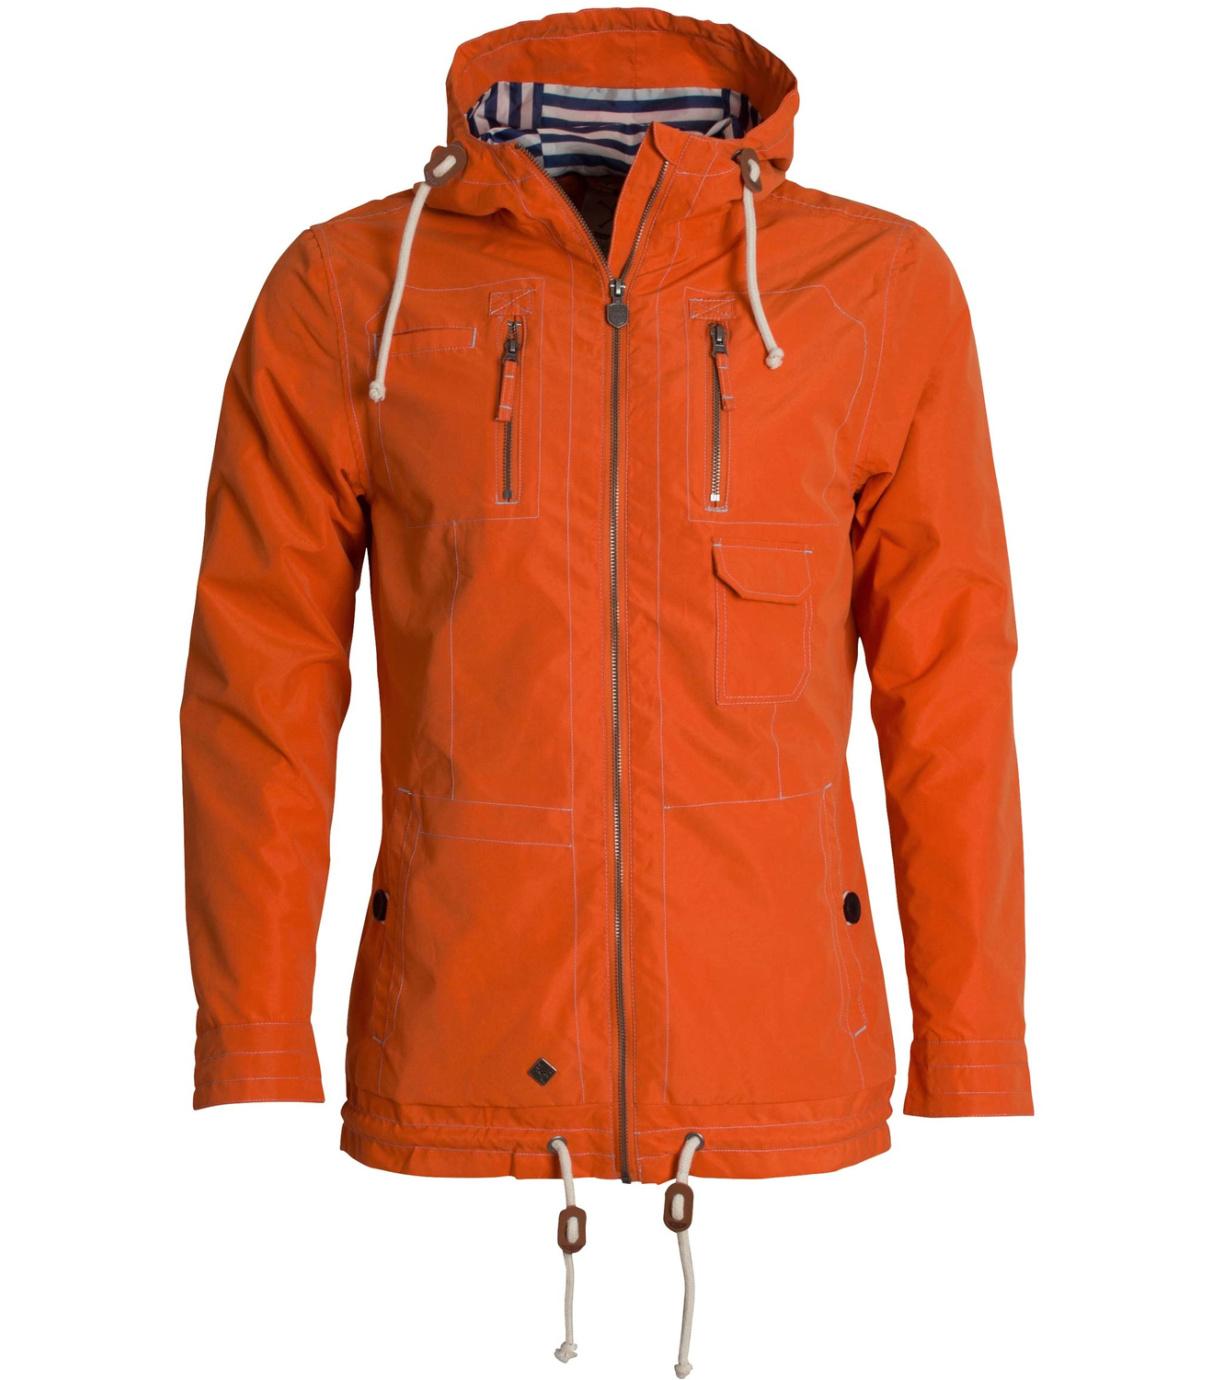 WOOX Větrovka Drizzle Jacket Men´s Orange wx1524002 XS